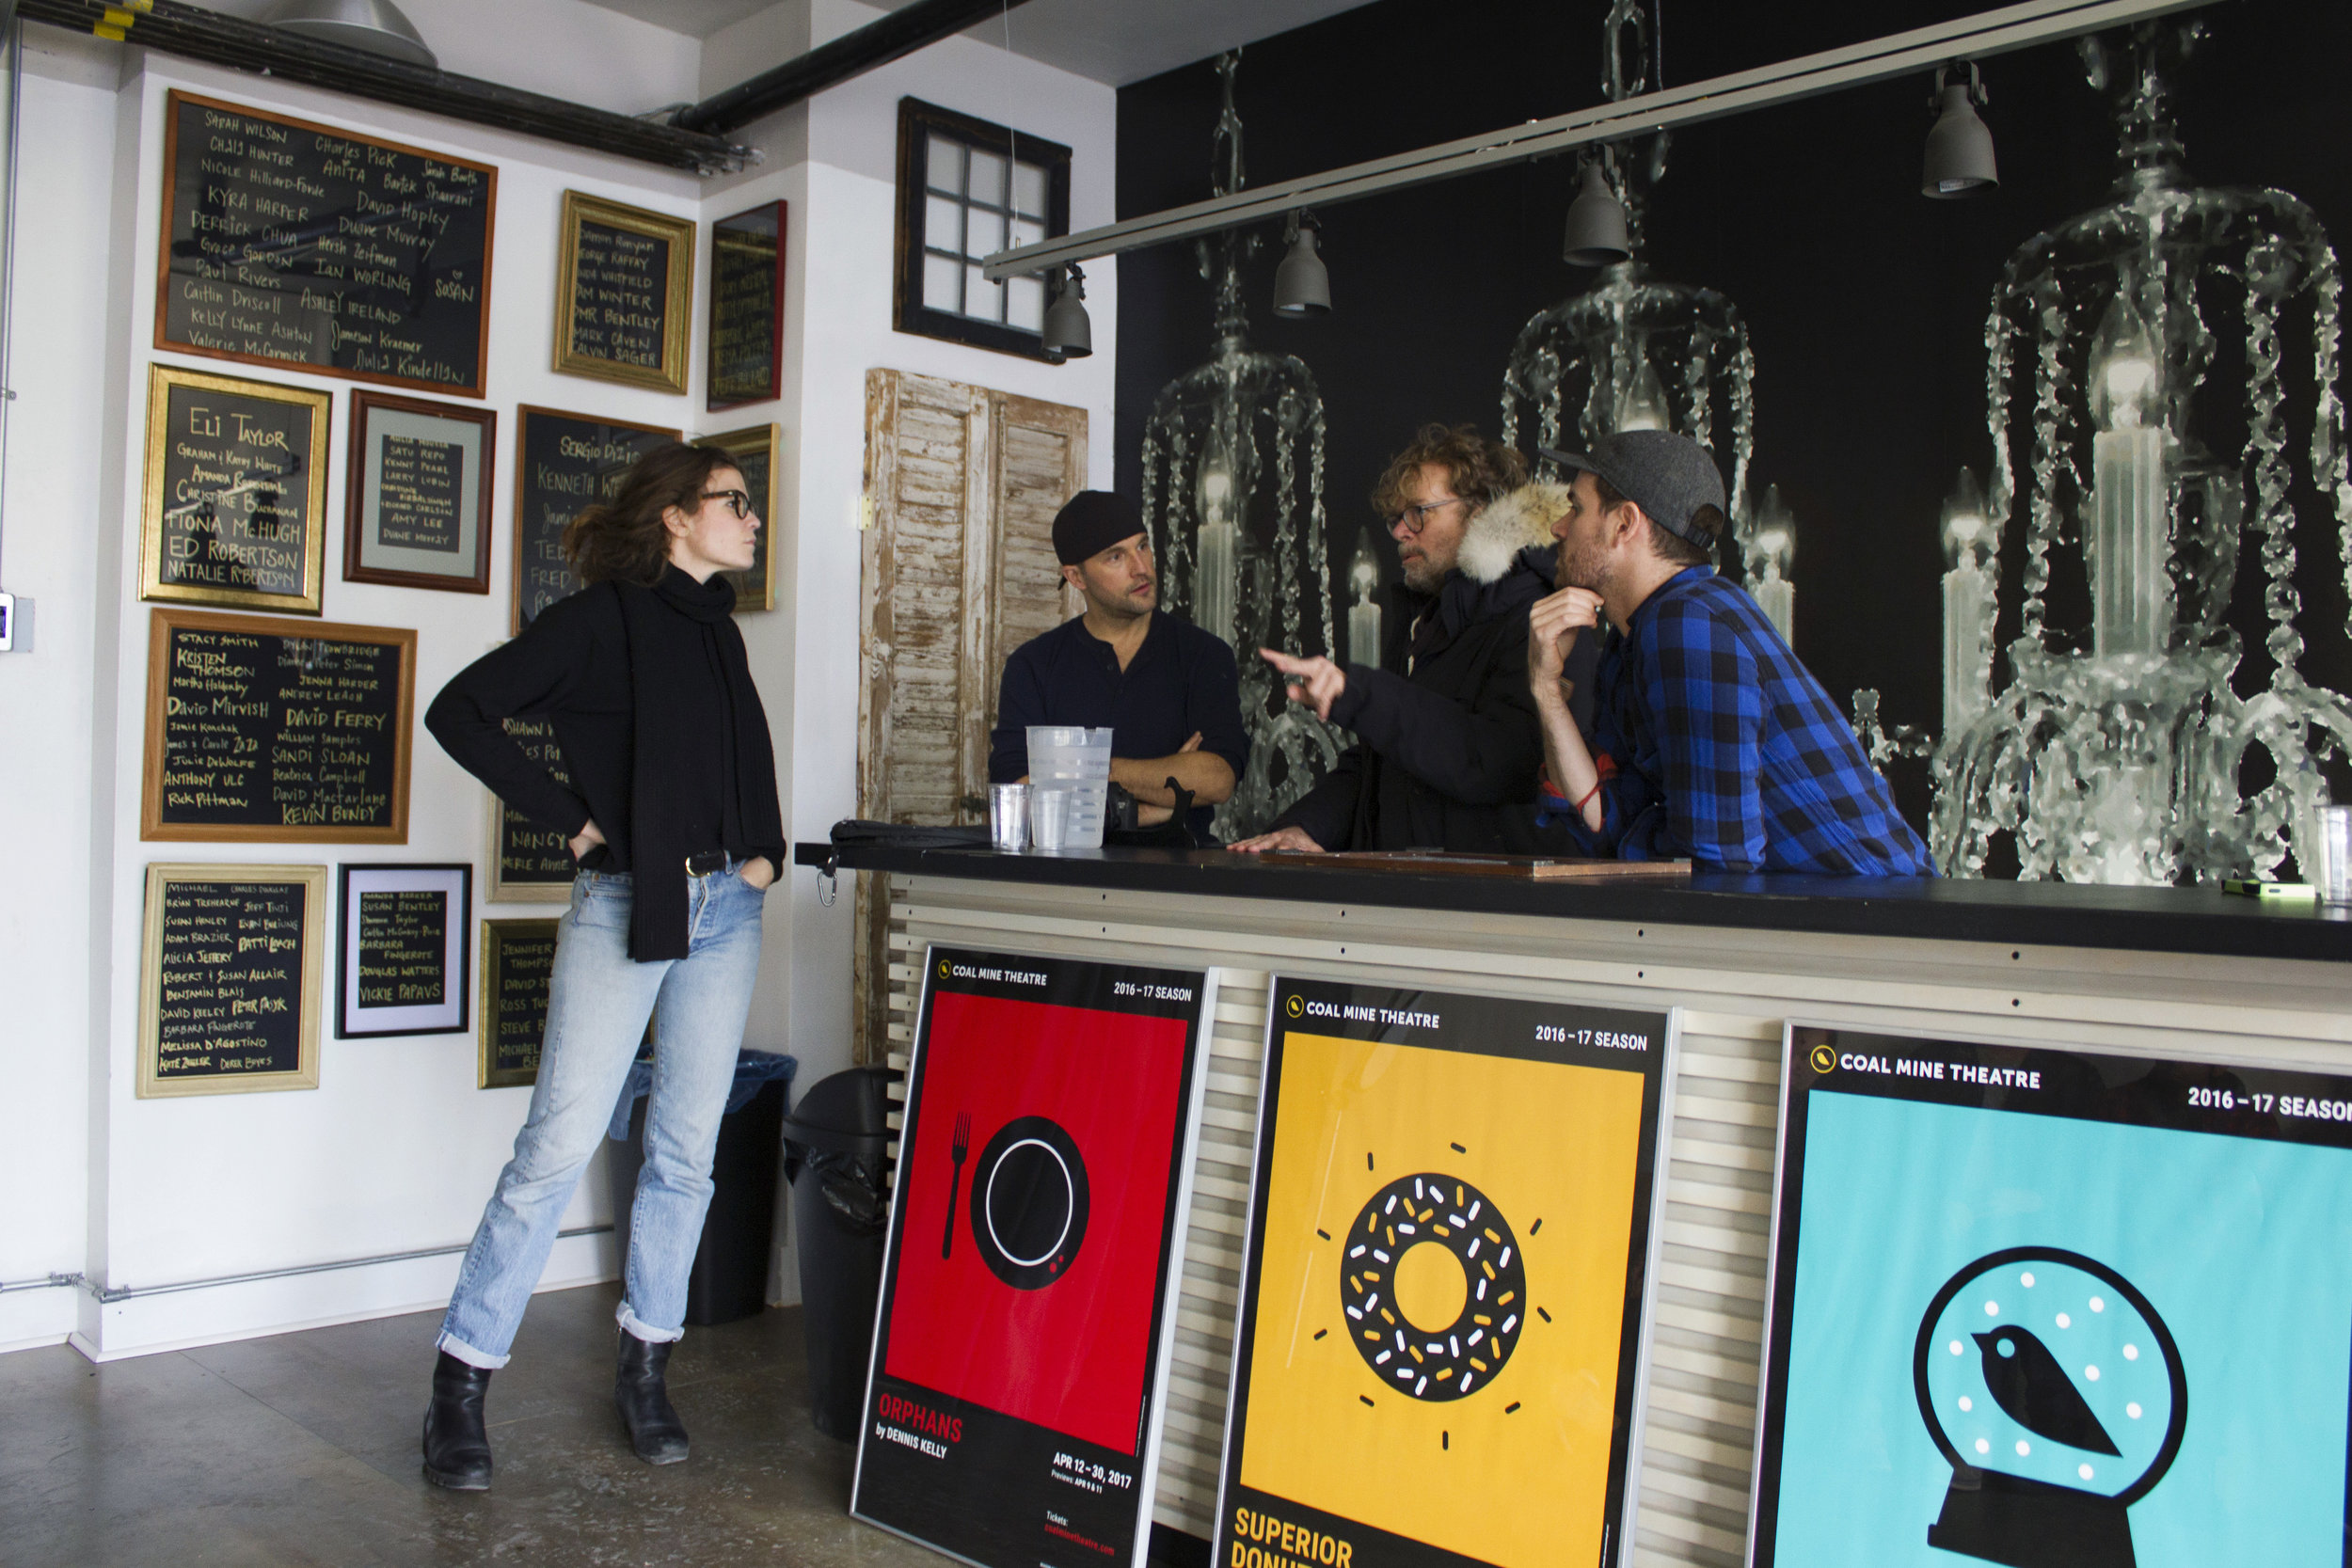 DIANA BENTLEY, SHAUN BENSON, TED DYKSTRA, and CHRIS HAYES on set